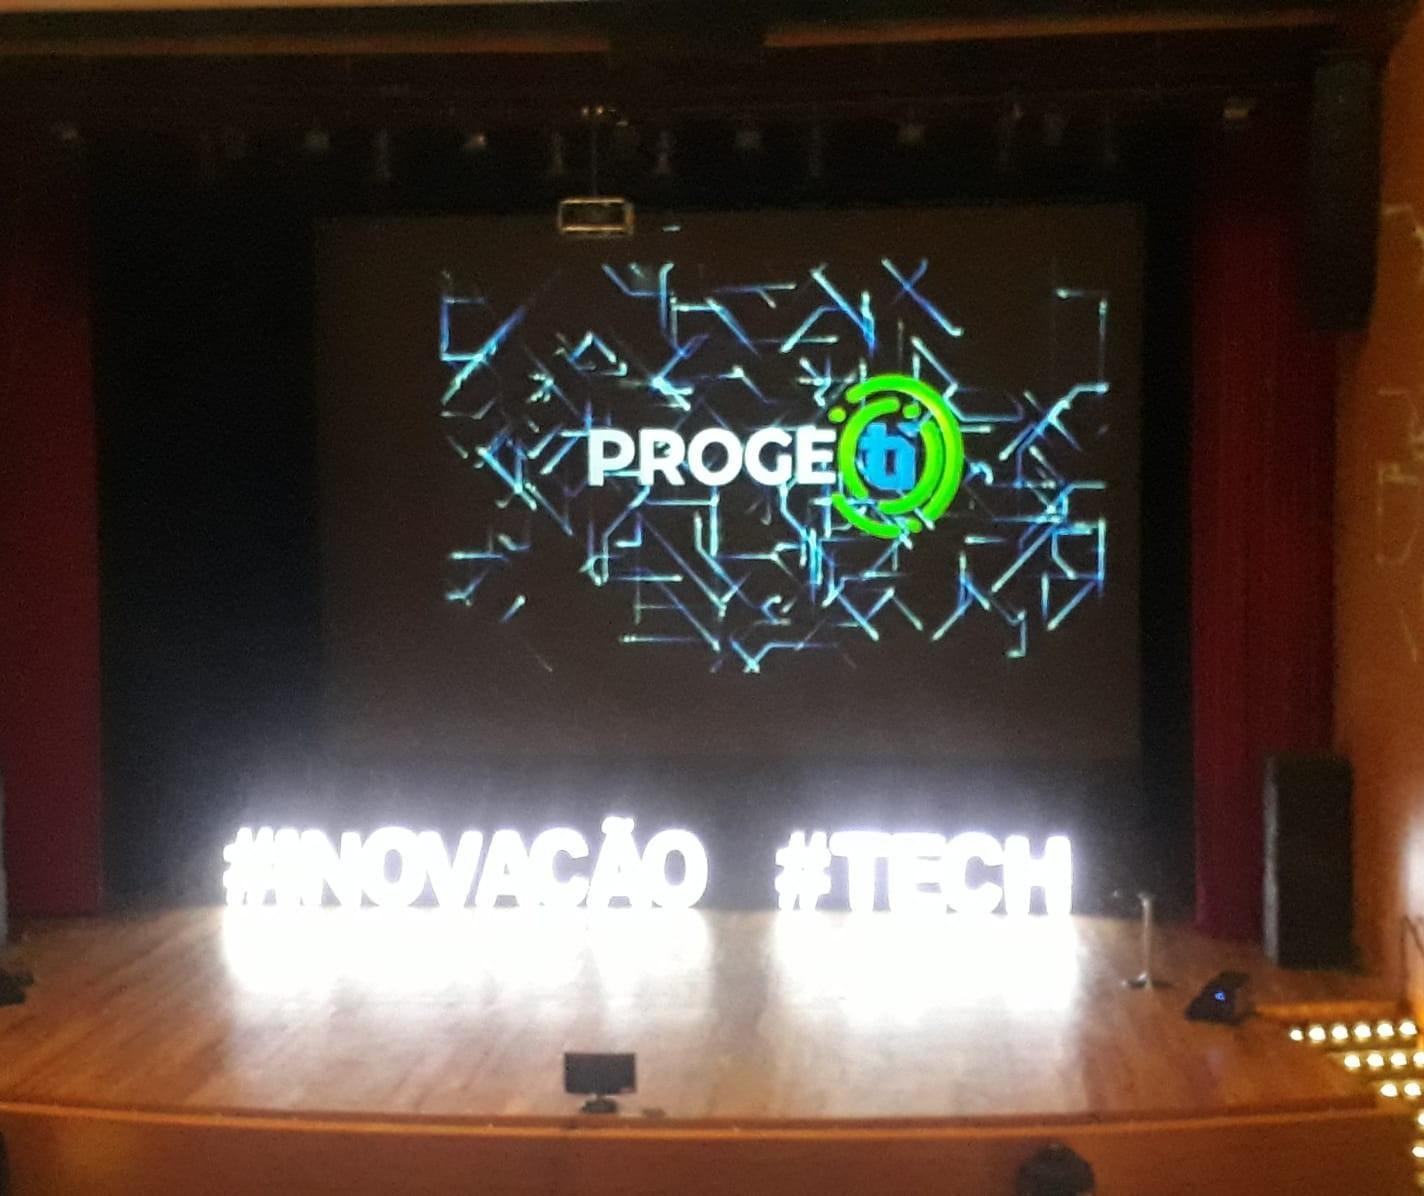 Cascavel lança programa ProgeTi